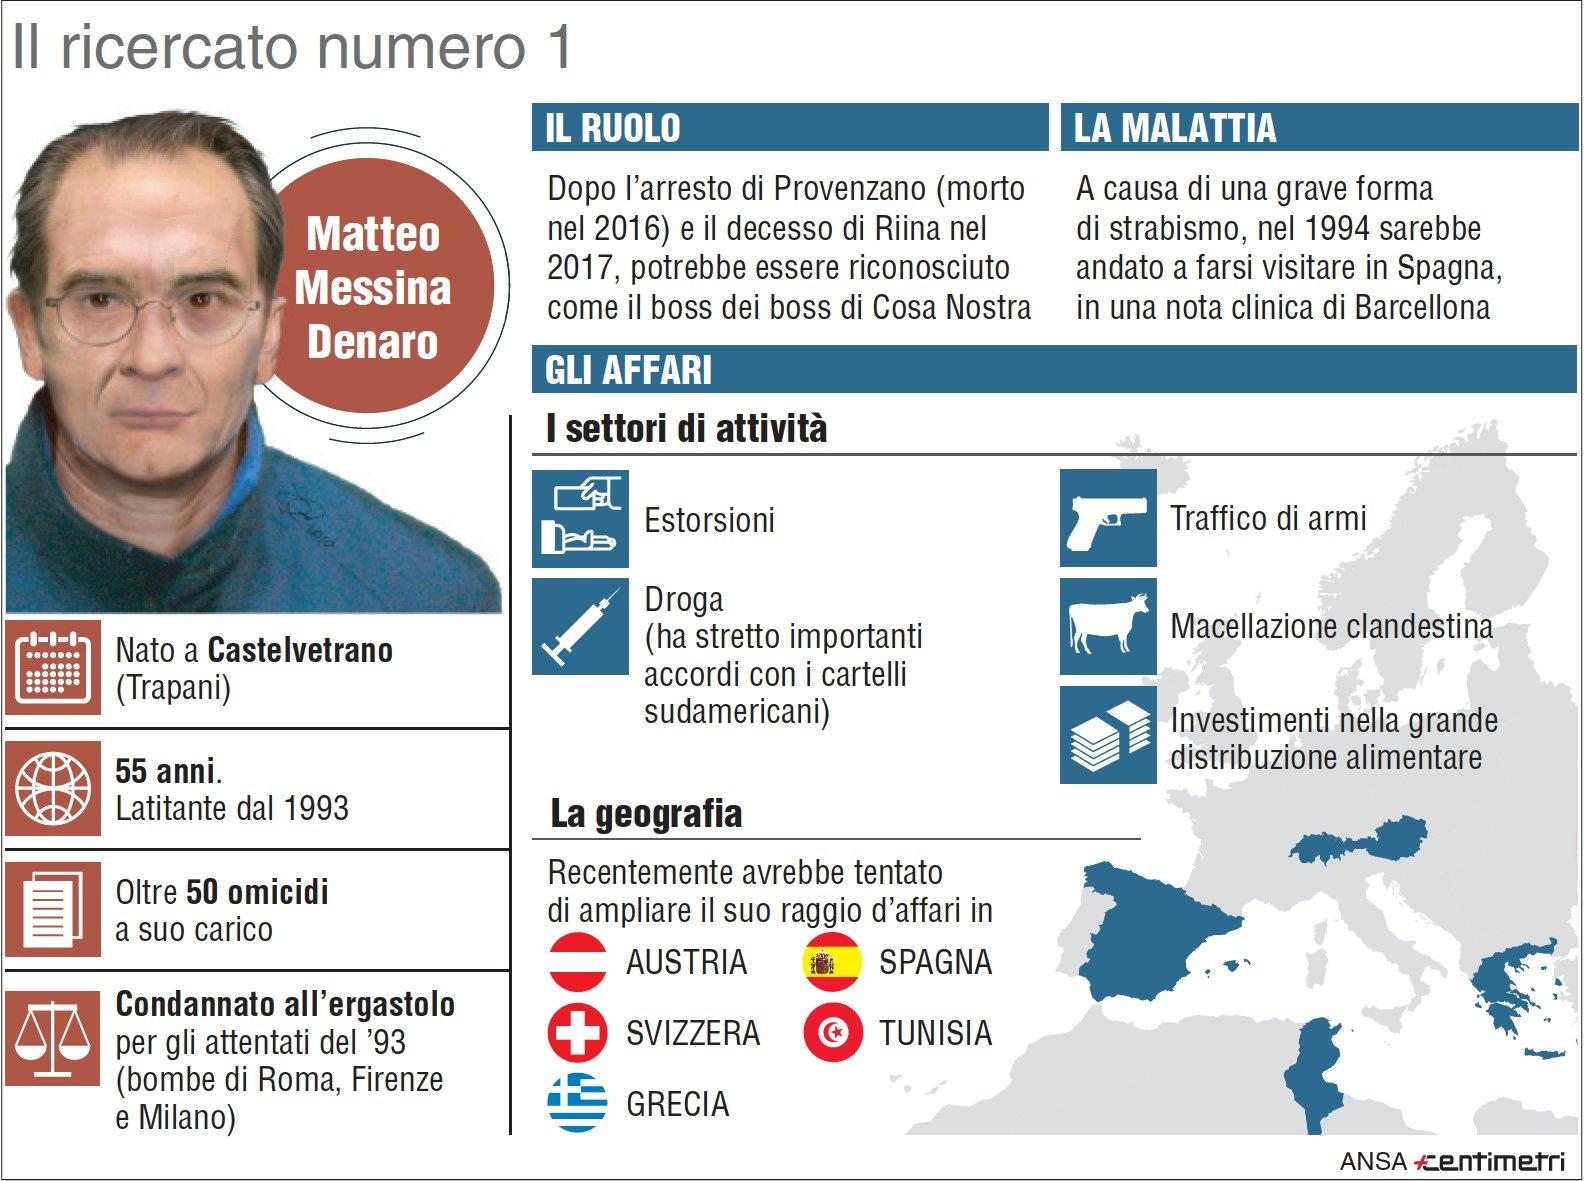 Il boss Matteo Messina Denaro